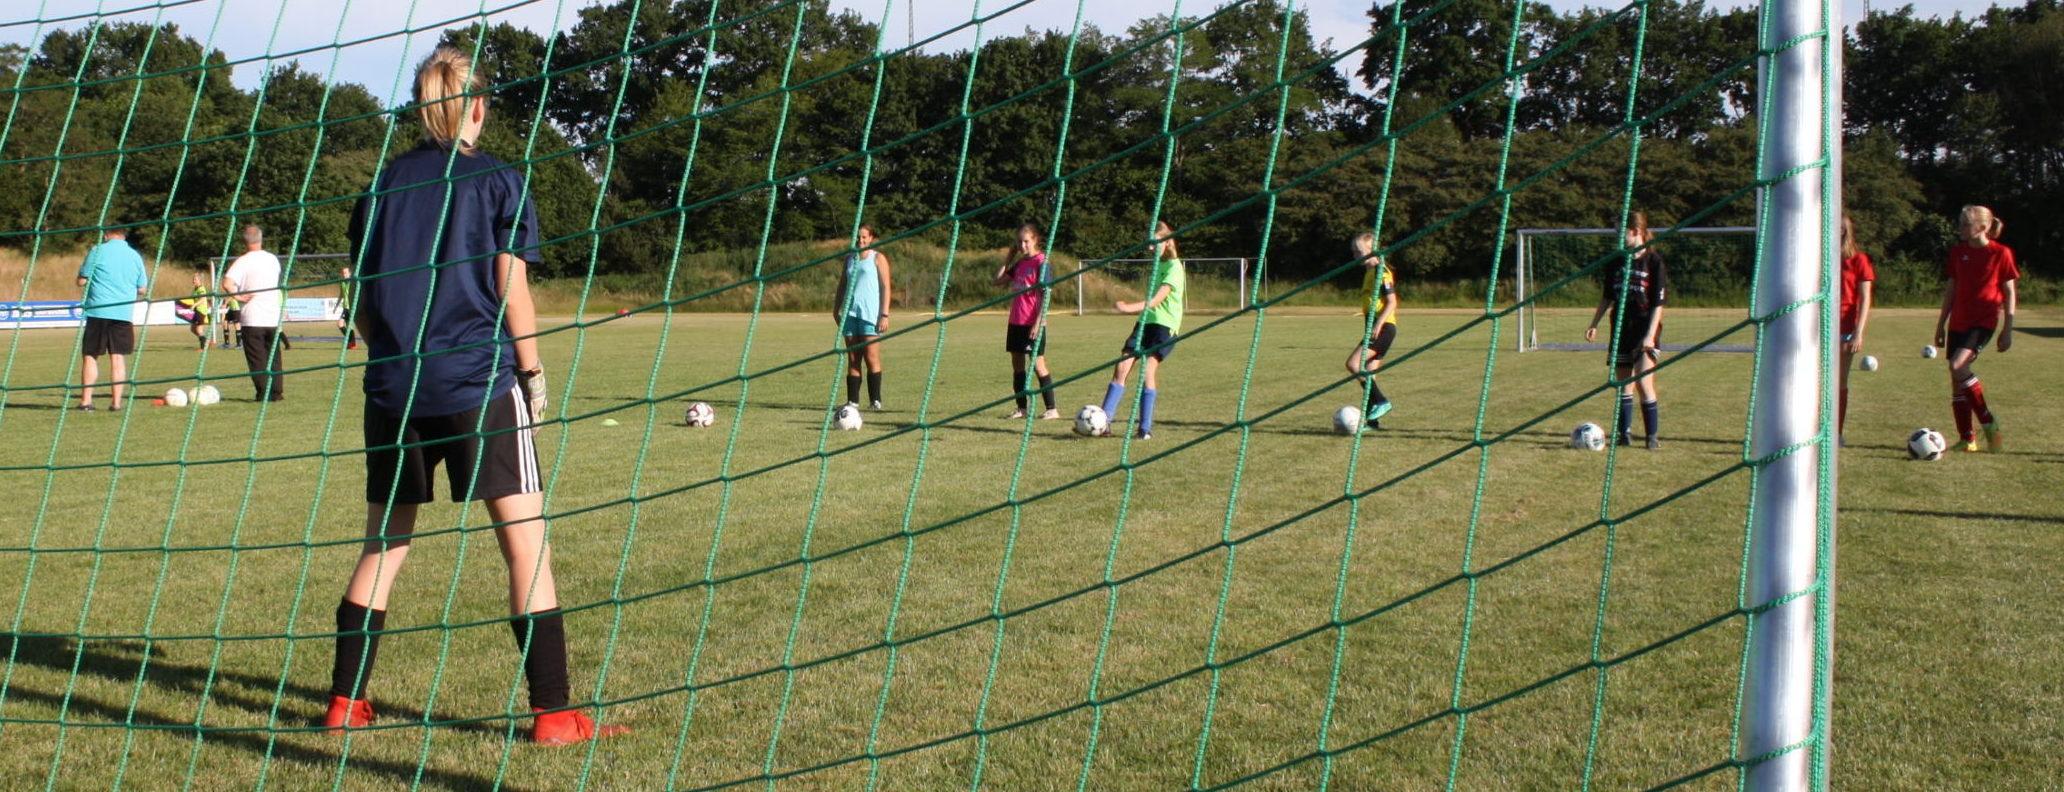 Ausbau unserer Partnerschaft im Mädchenfußball